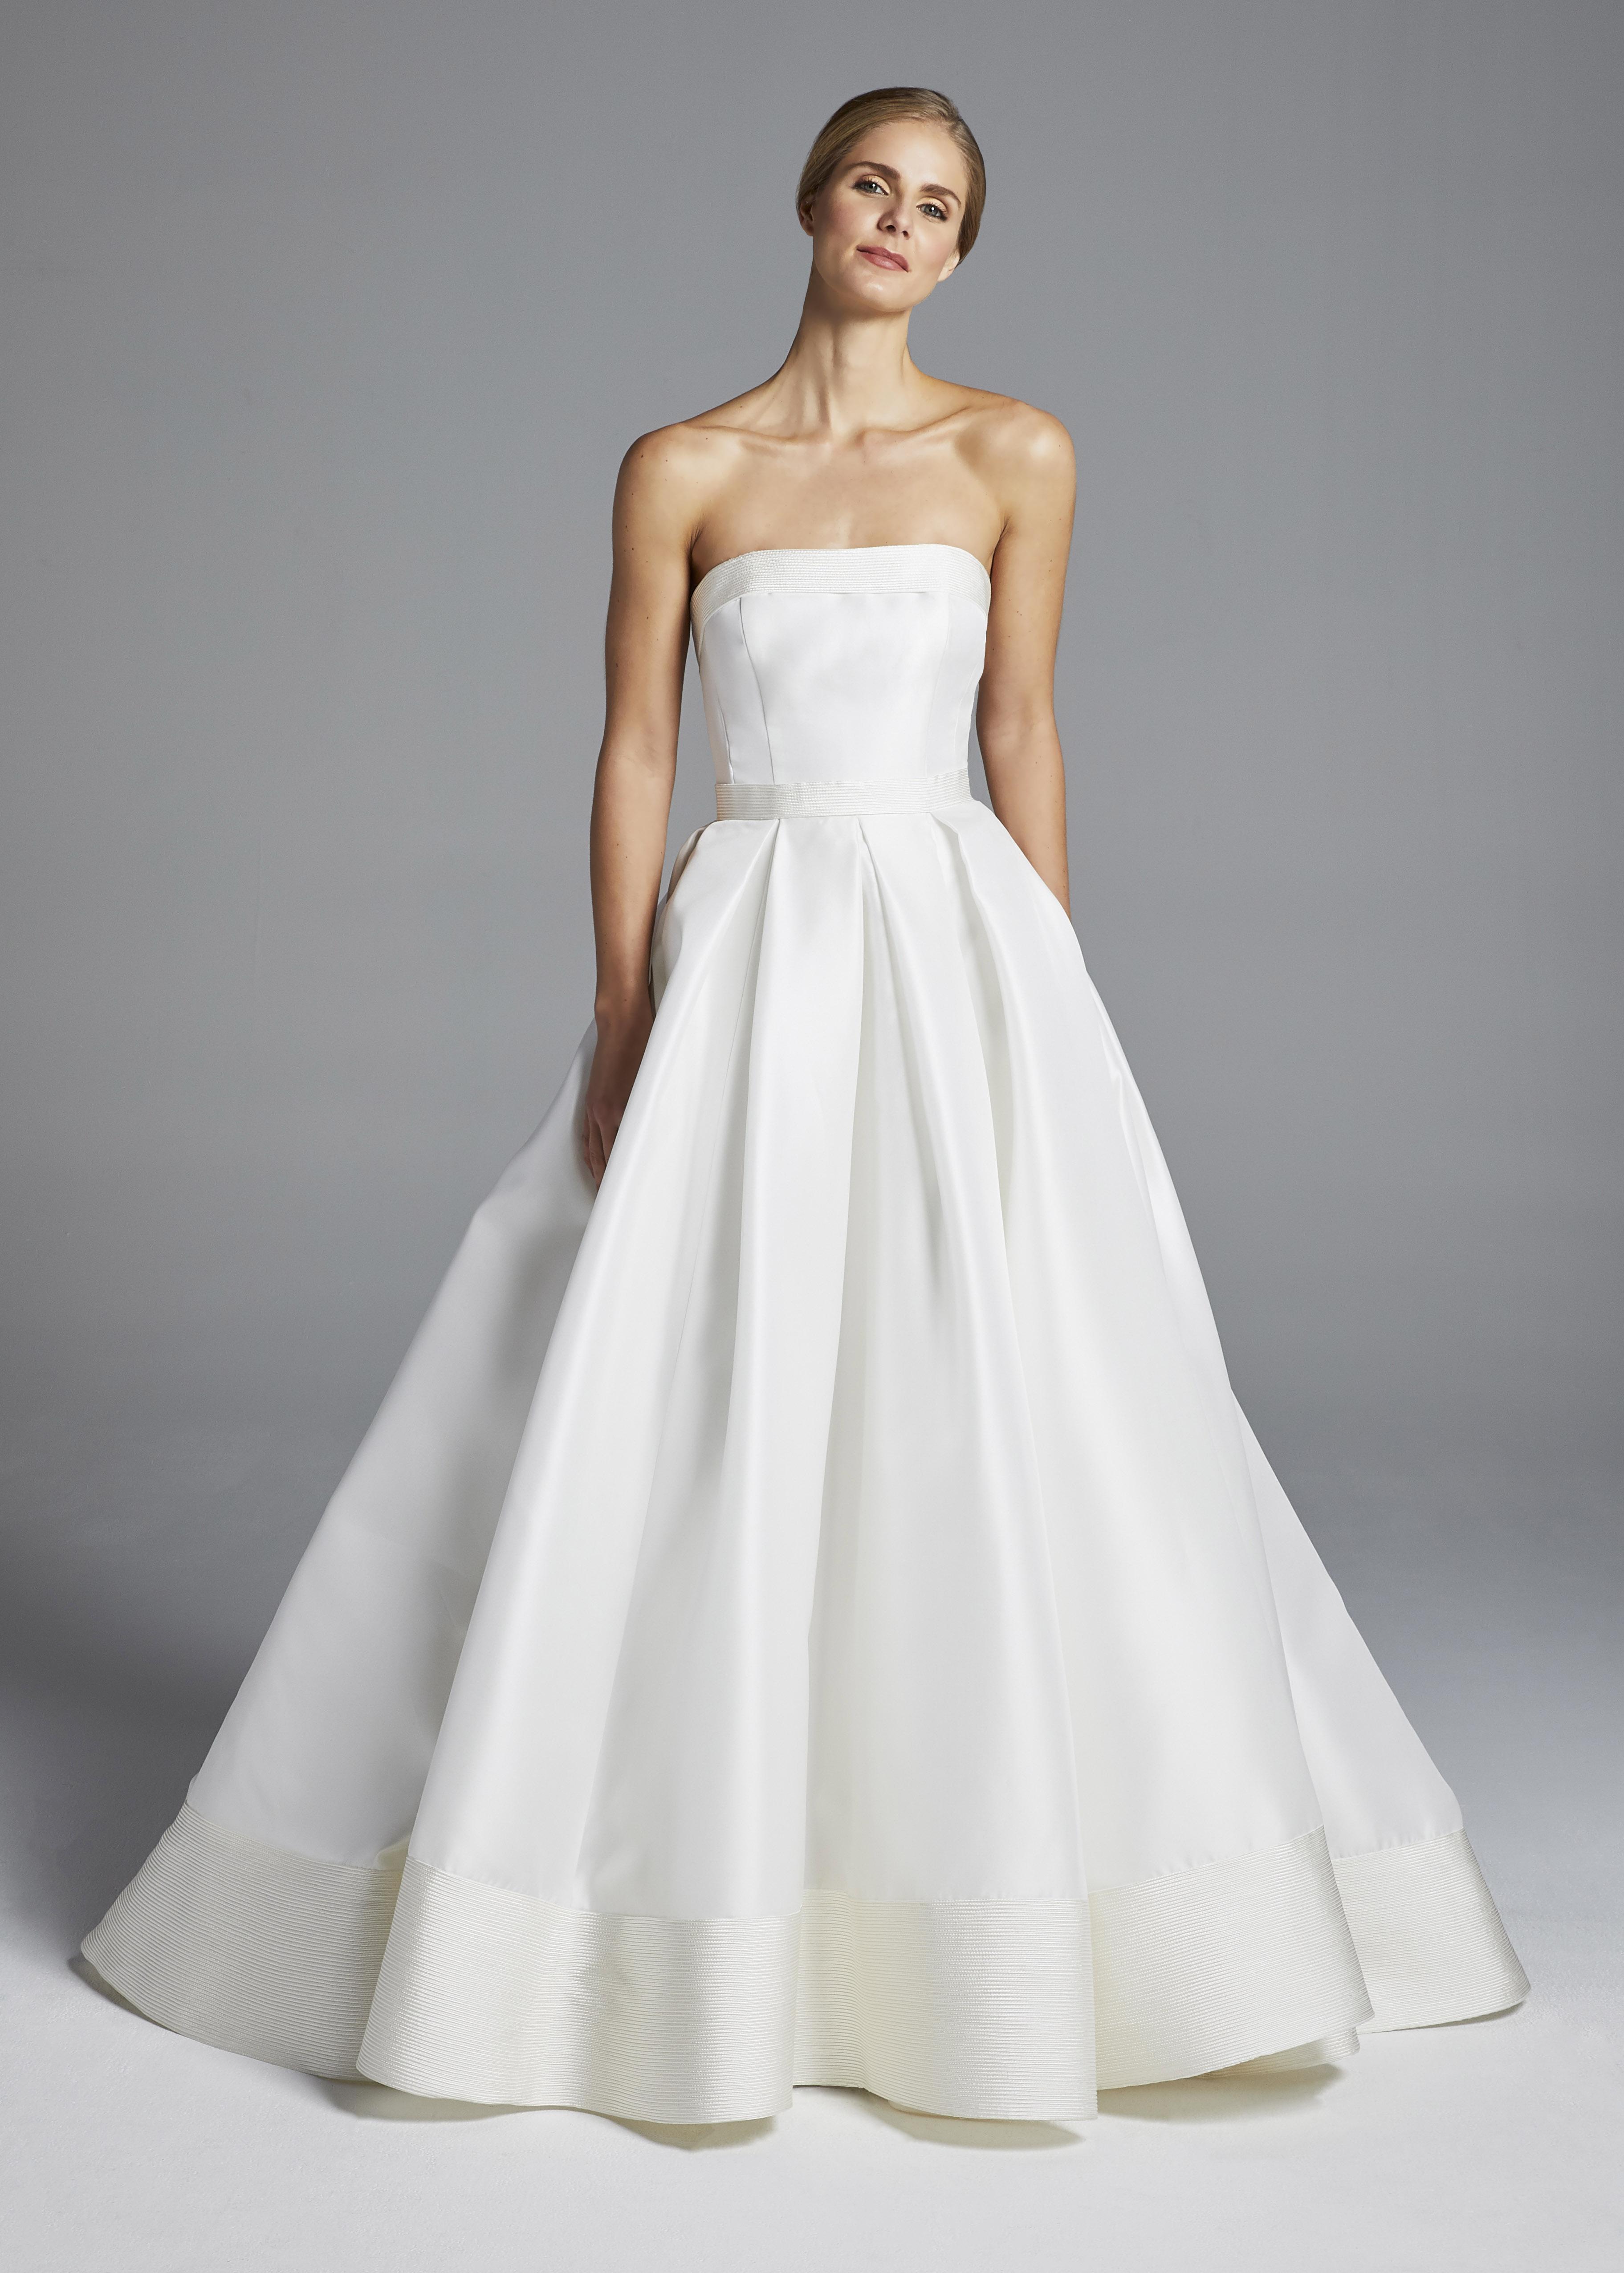 anne barge strapless A-Line wedding dress spring 2019